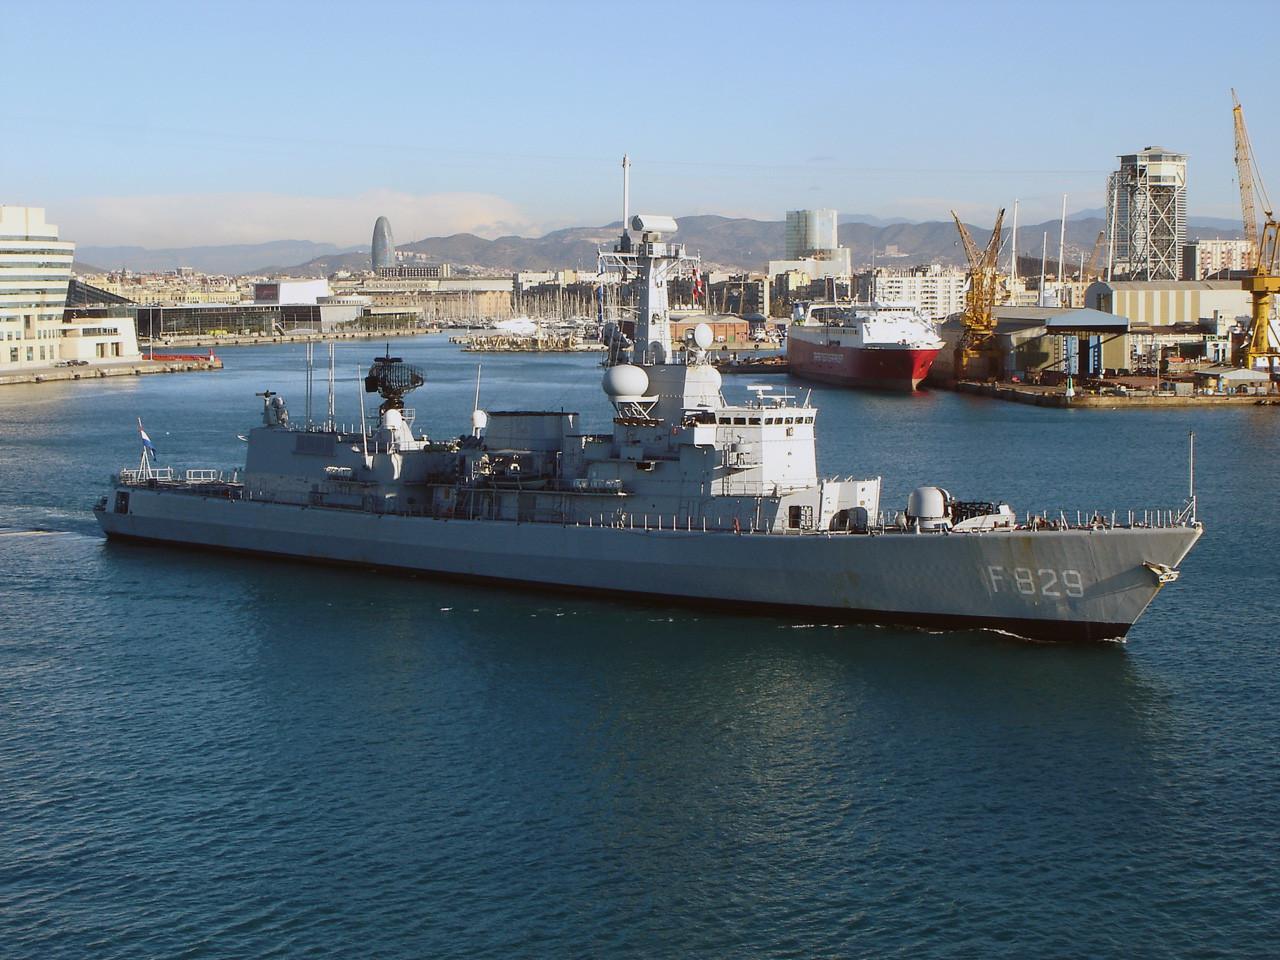 M-klasse fregatten (Karel Doorman M-class frigates) 162638